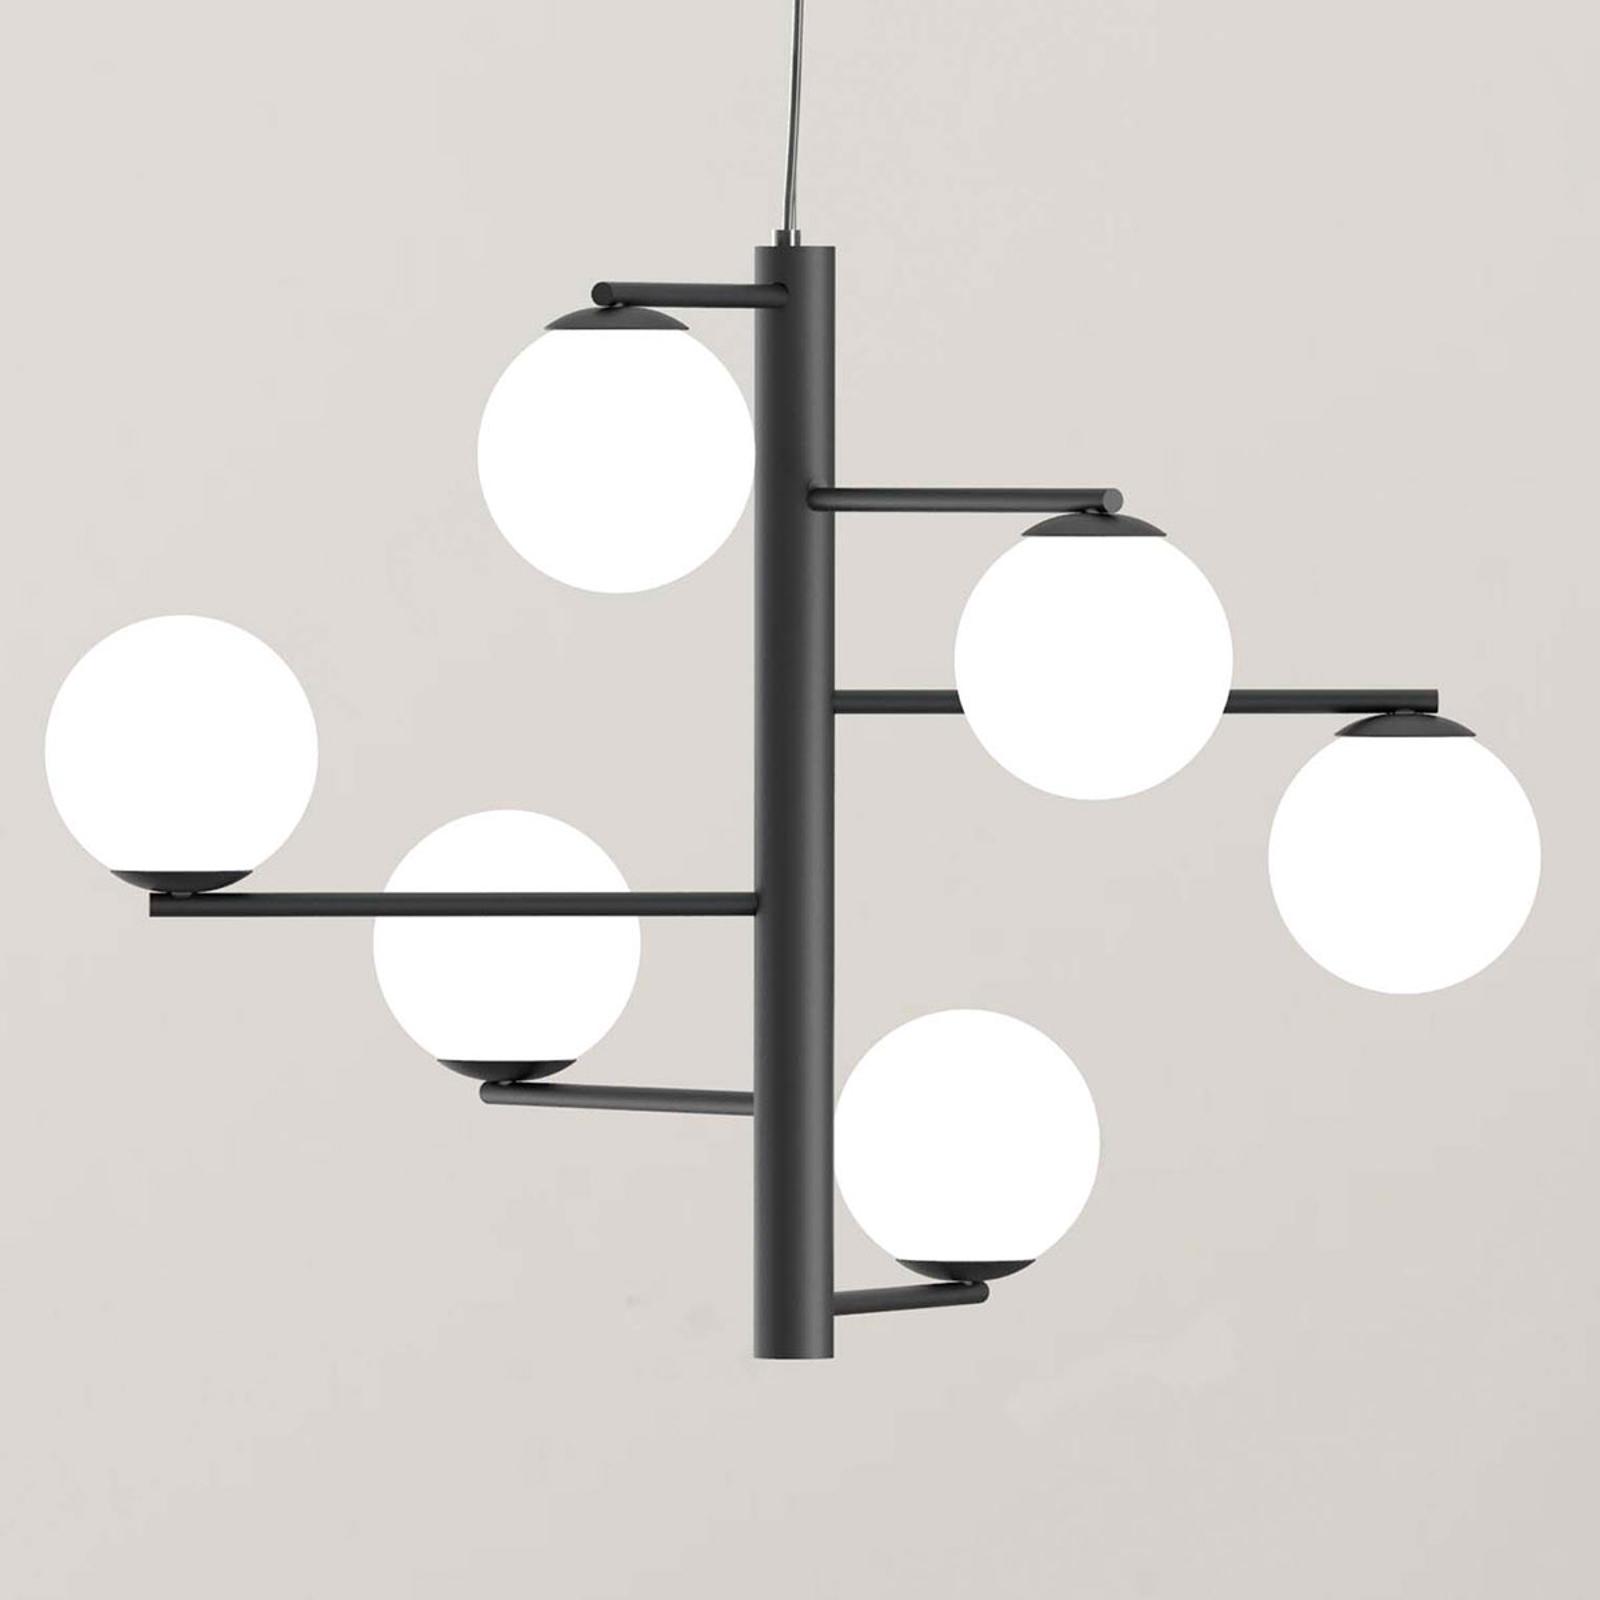 Lampa wisząca Tin Tin 6-punktowa czarna